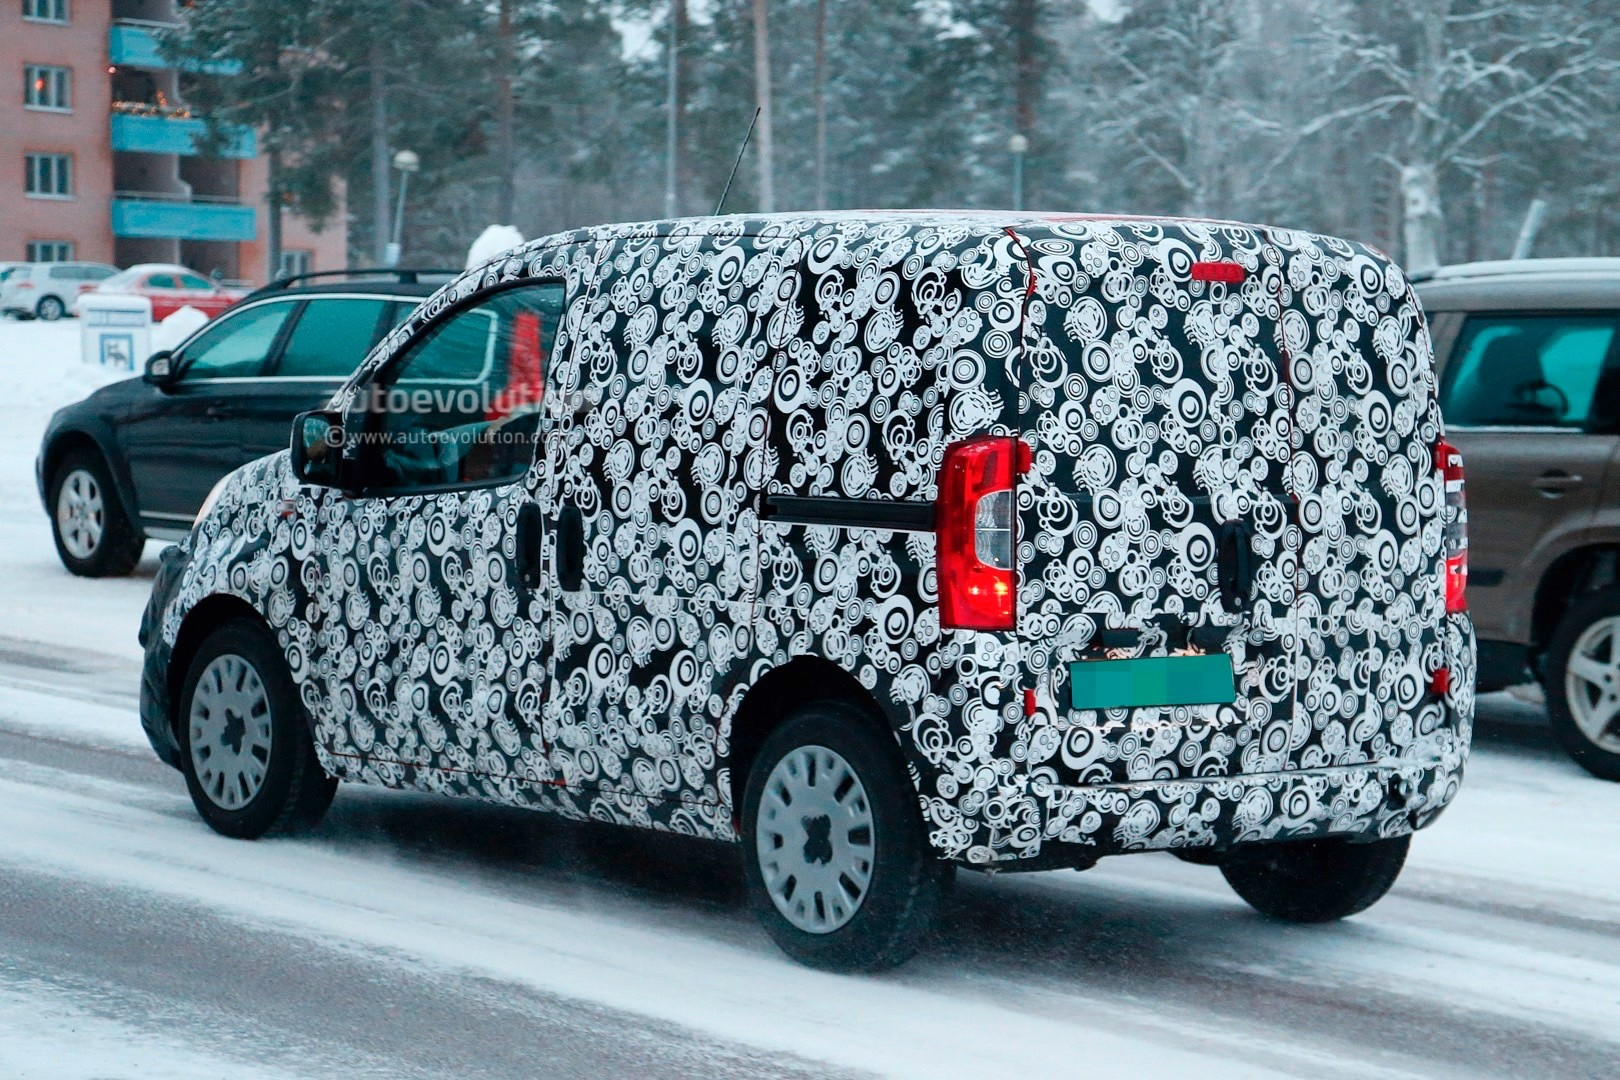 New Fiat Qubo Fiorino Facelift Might Cross The Atlantic